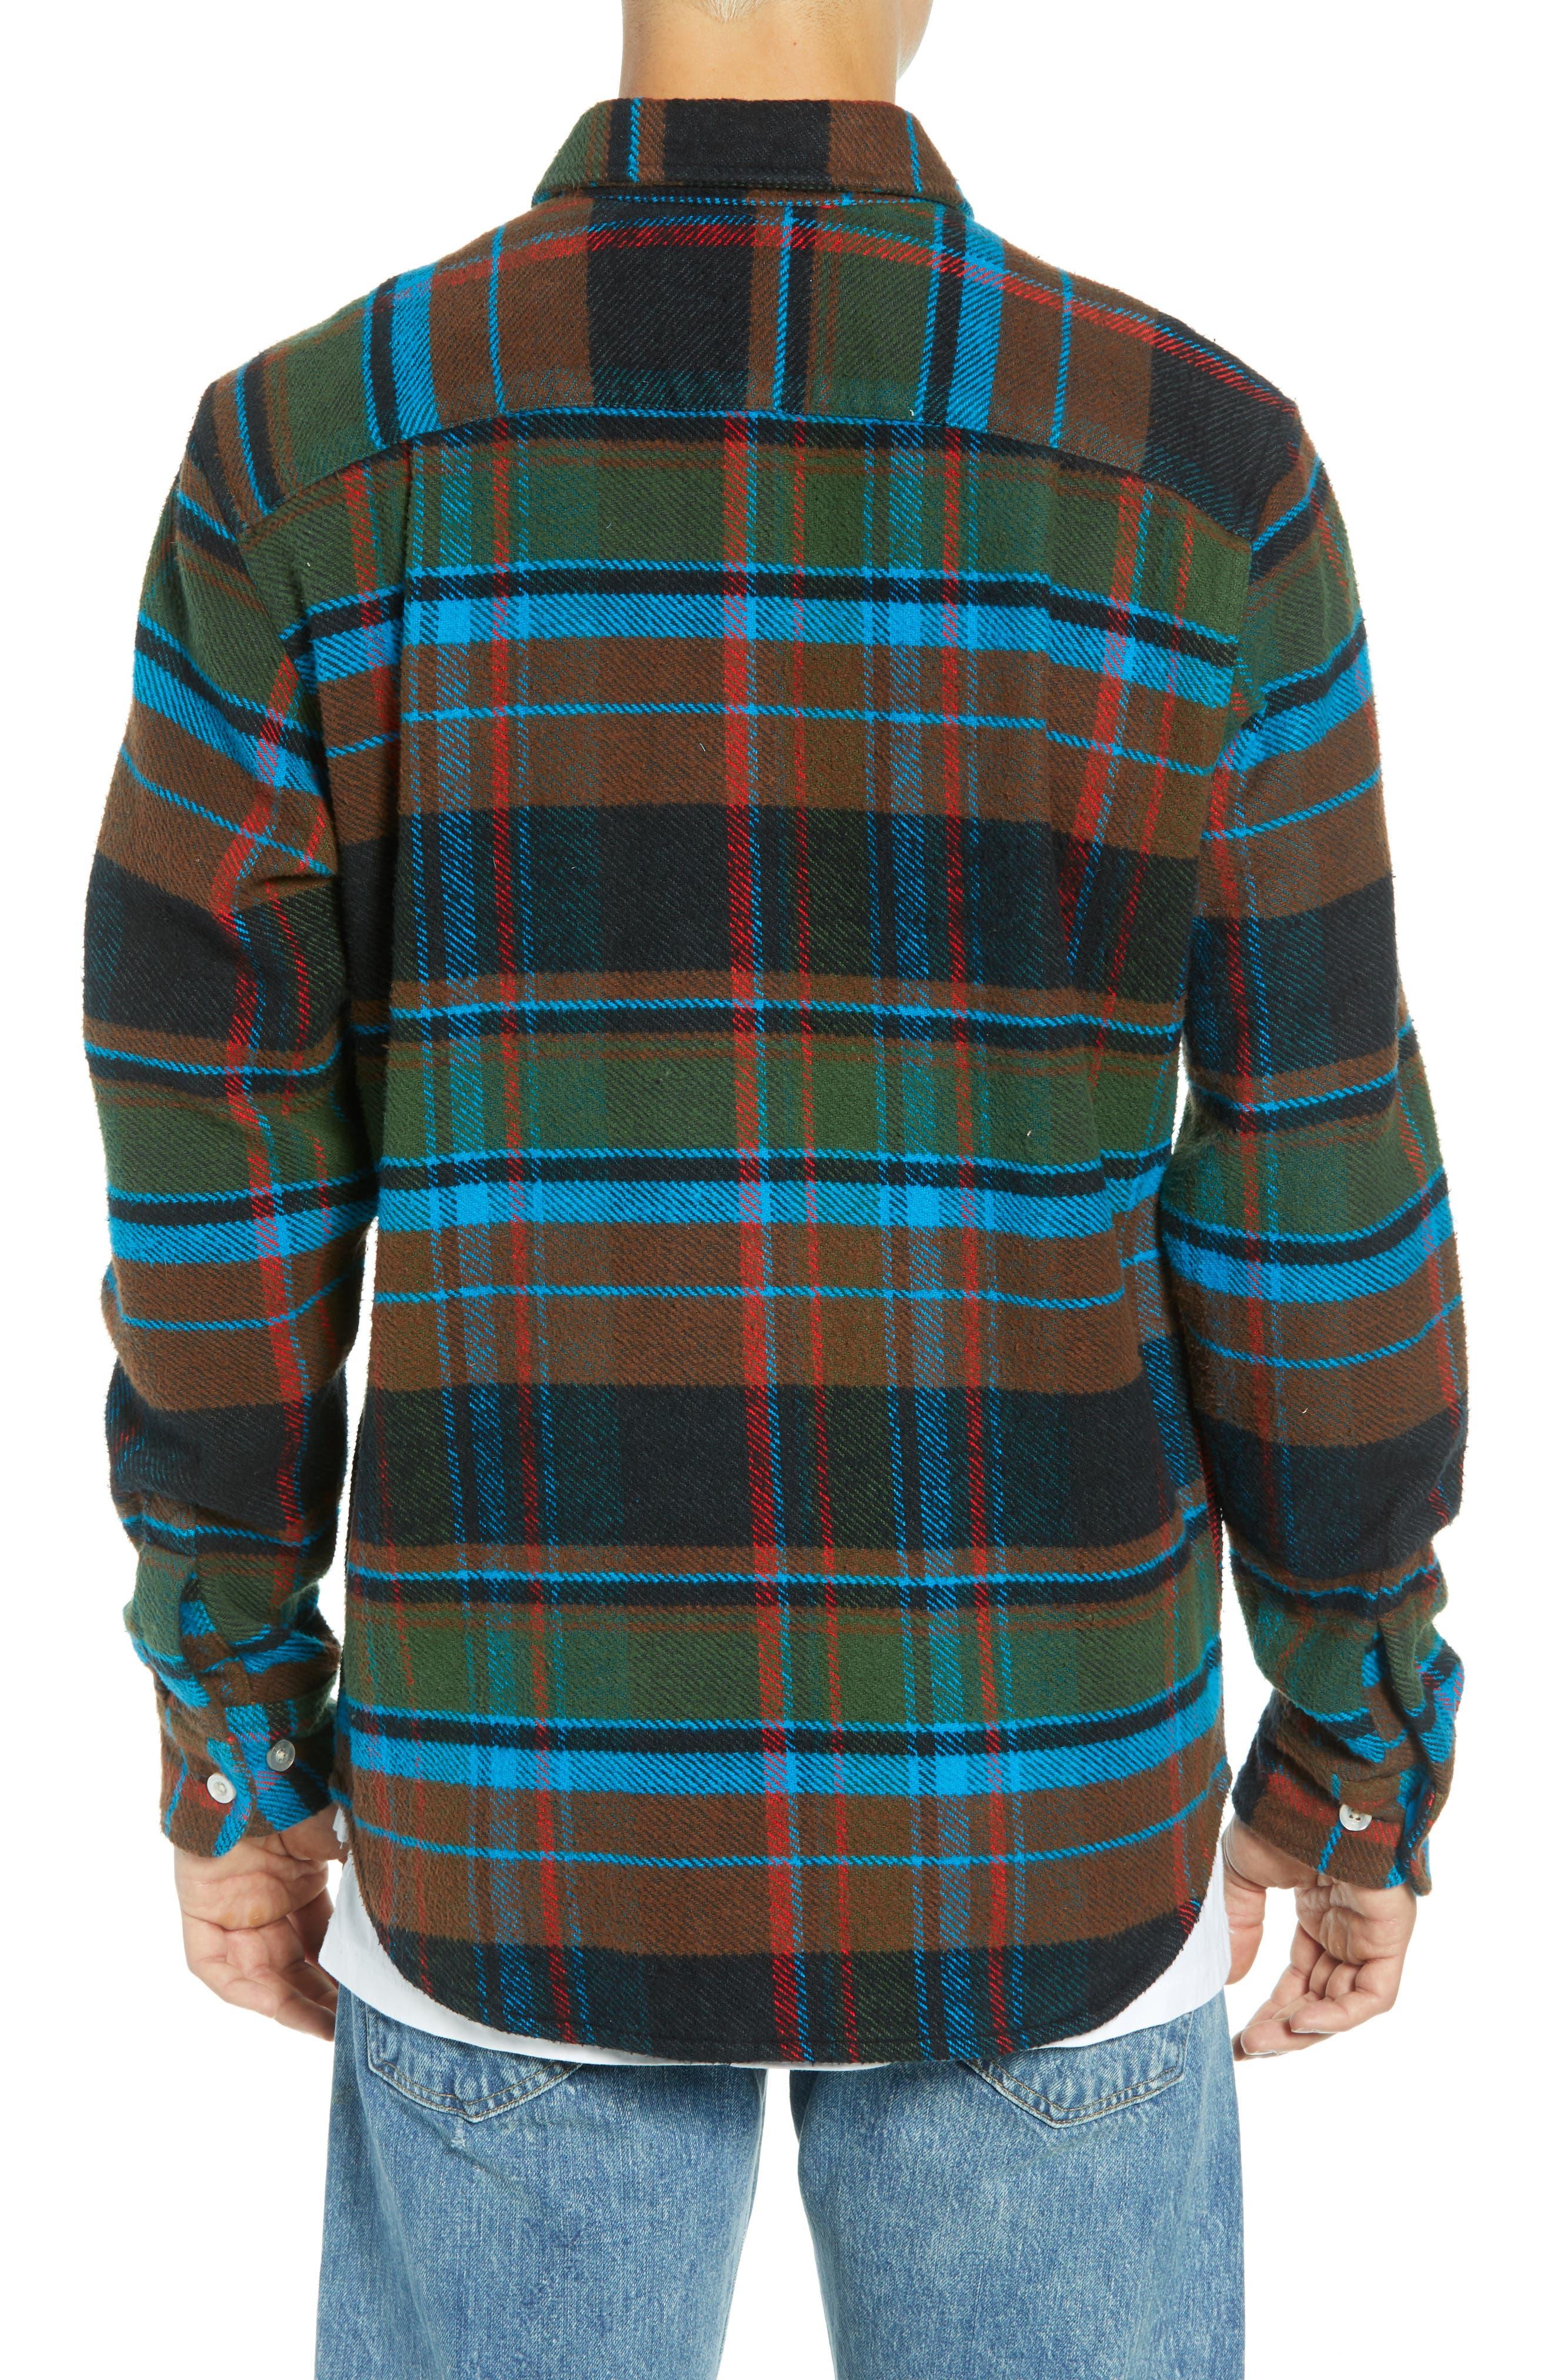 Homebound Heavy Plaid Flannel Shirt Jacket,                             Alternate thumbnail 3, color,                             BLACK FORREST MULTI